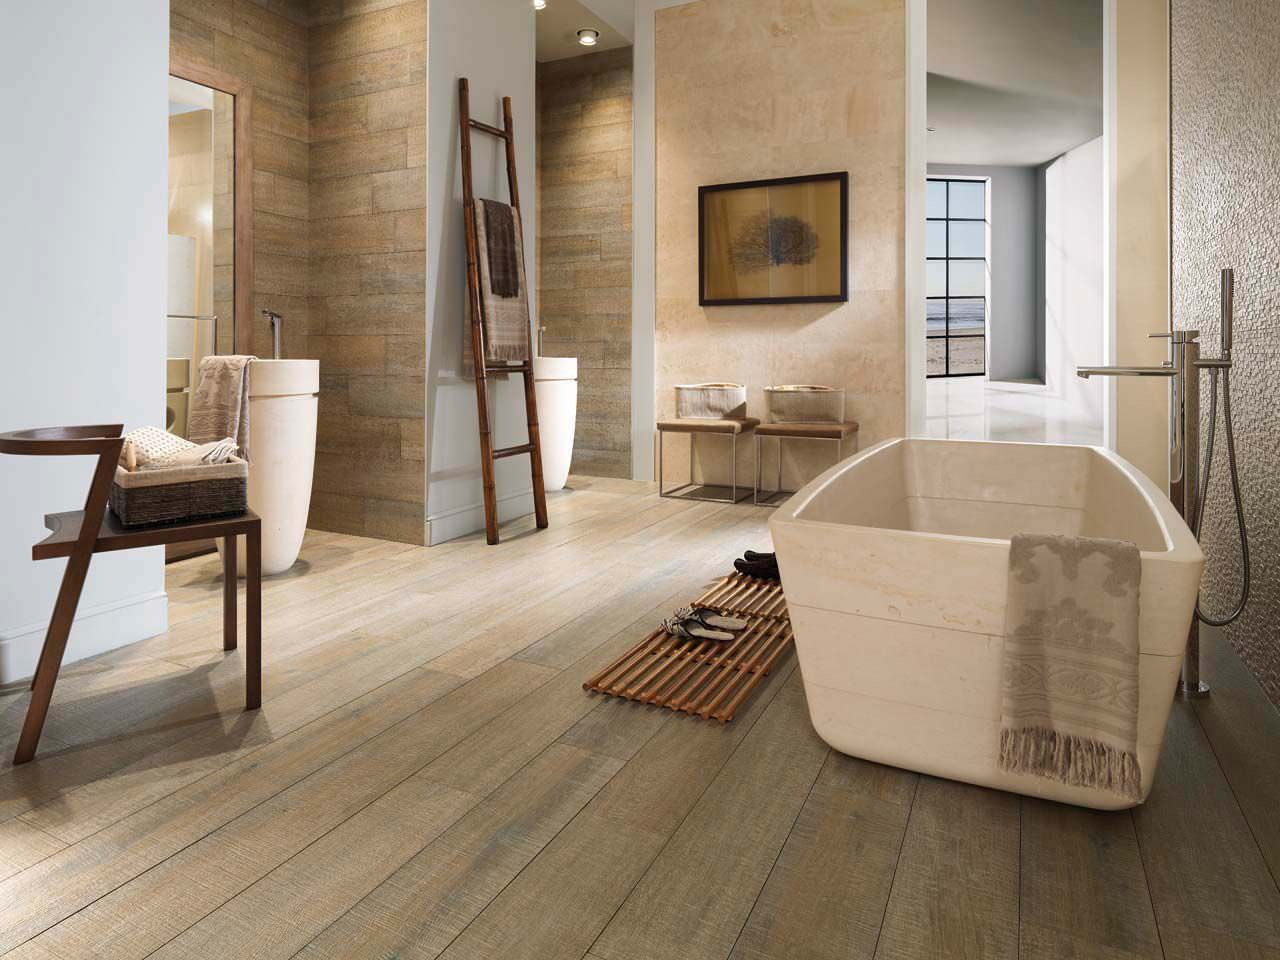 Pavimento effetto legno in gres porcellanato for Carrelage salle de bains porcelanosa